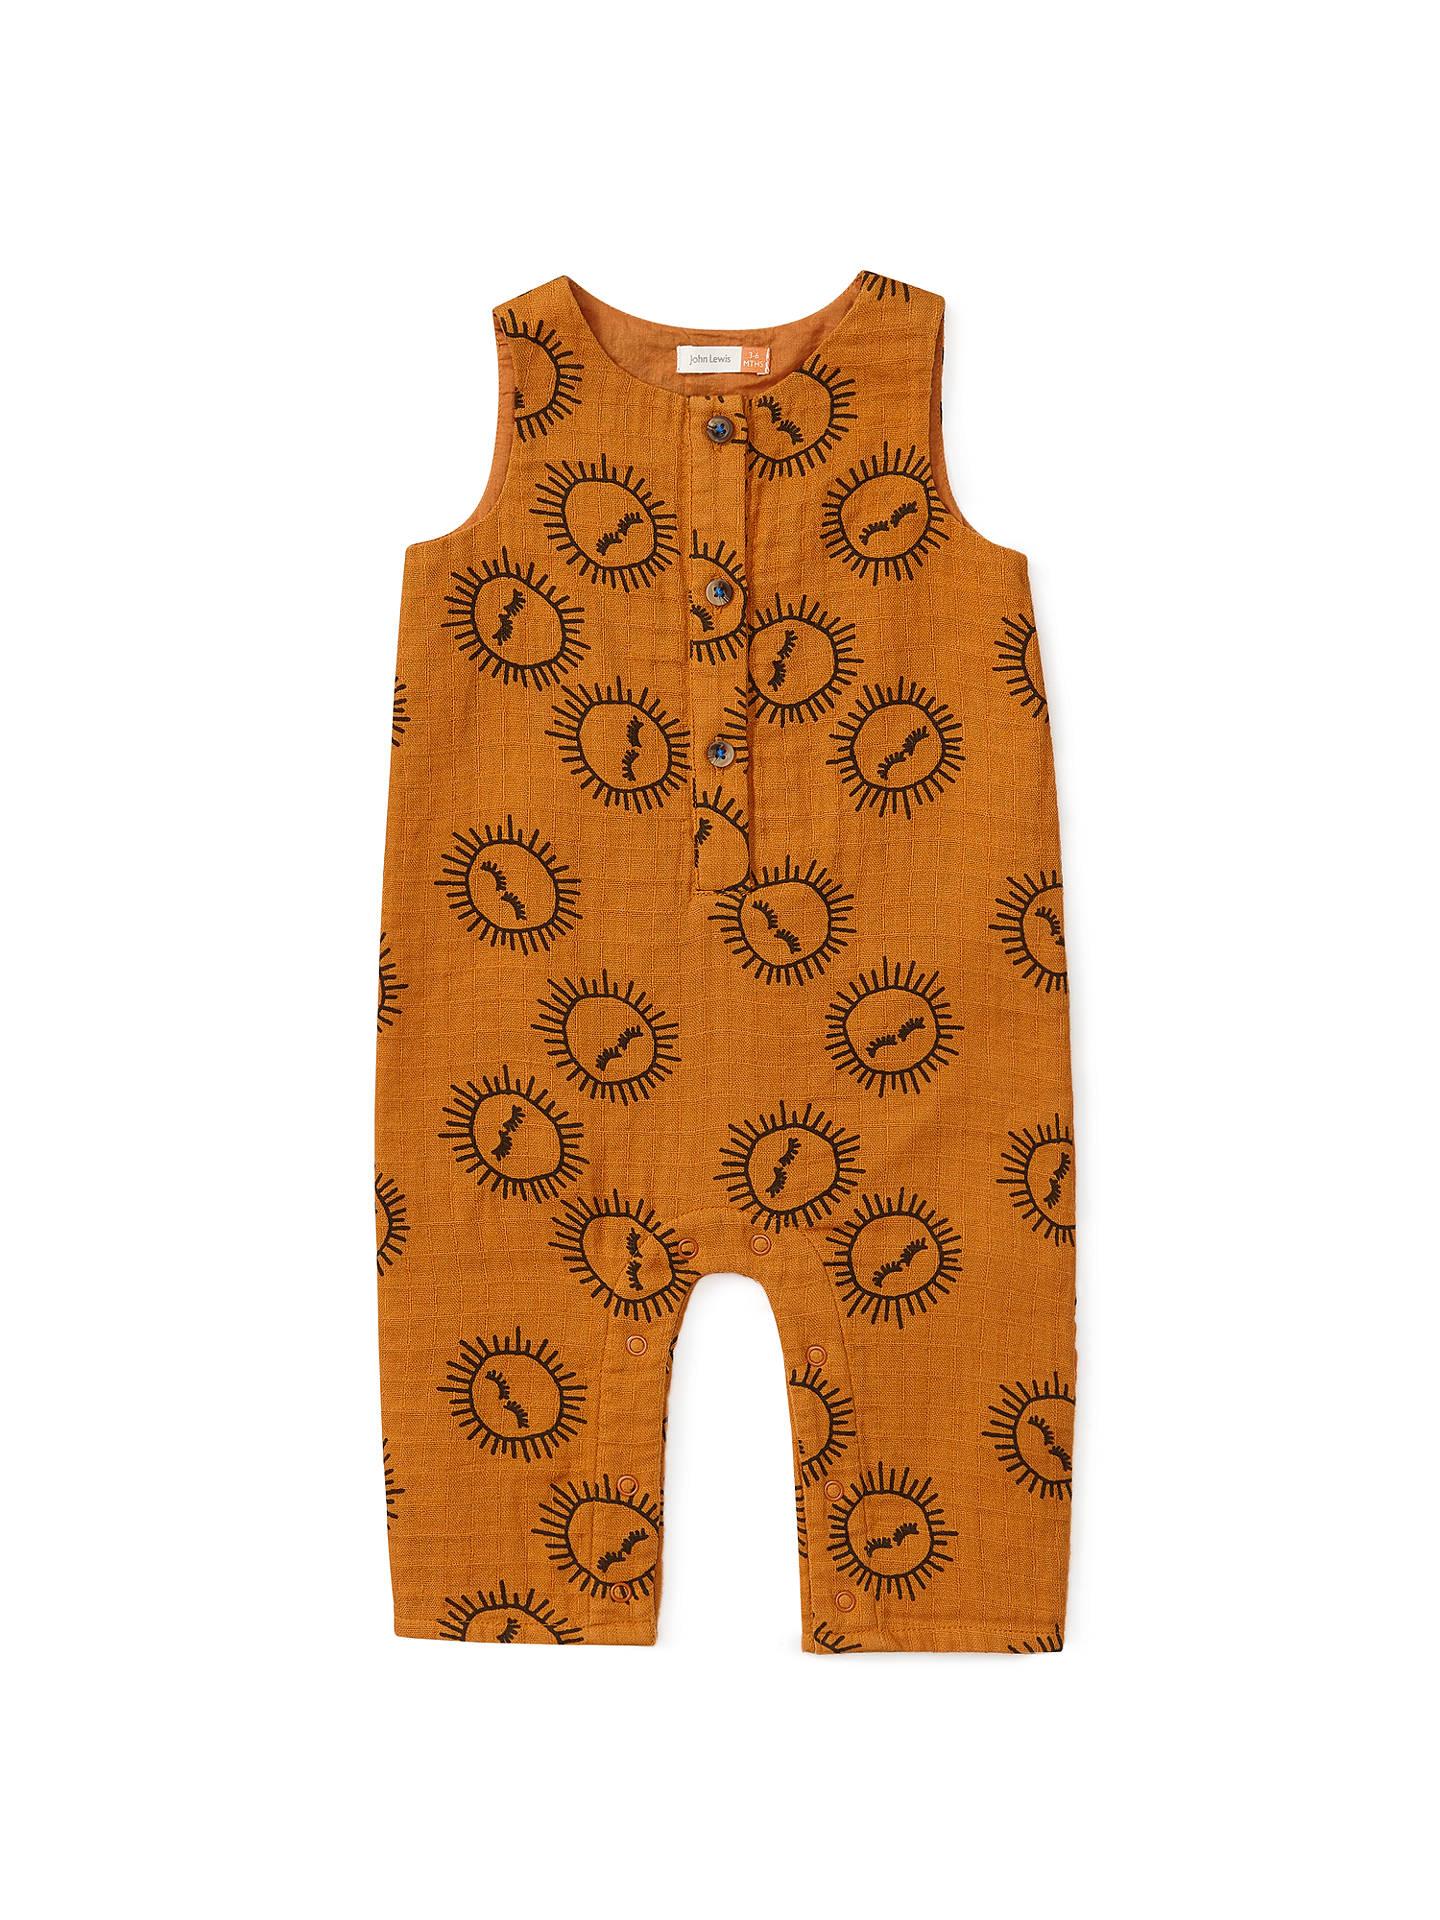 3db51f0b0 John Lewis   Partners Baby Organic Cotton Sun Print Romper